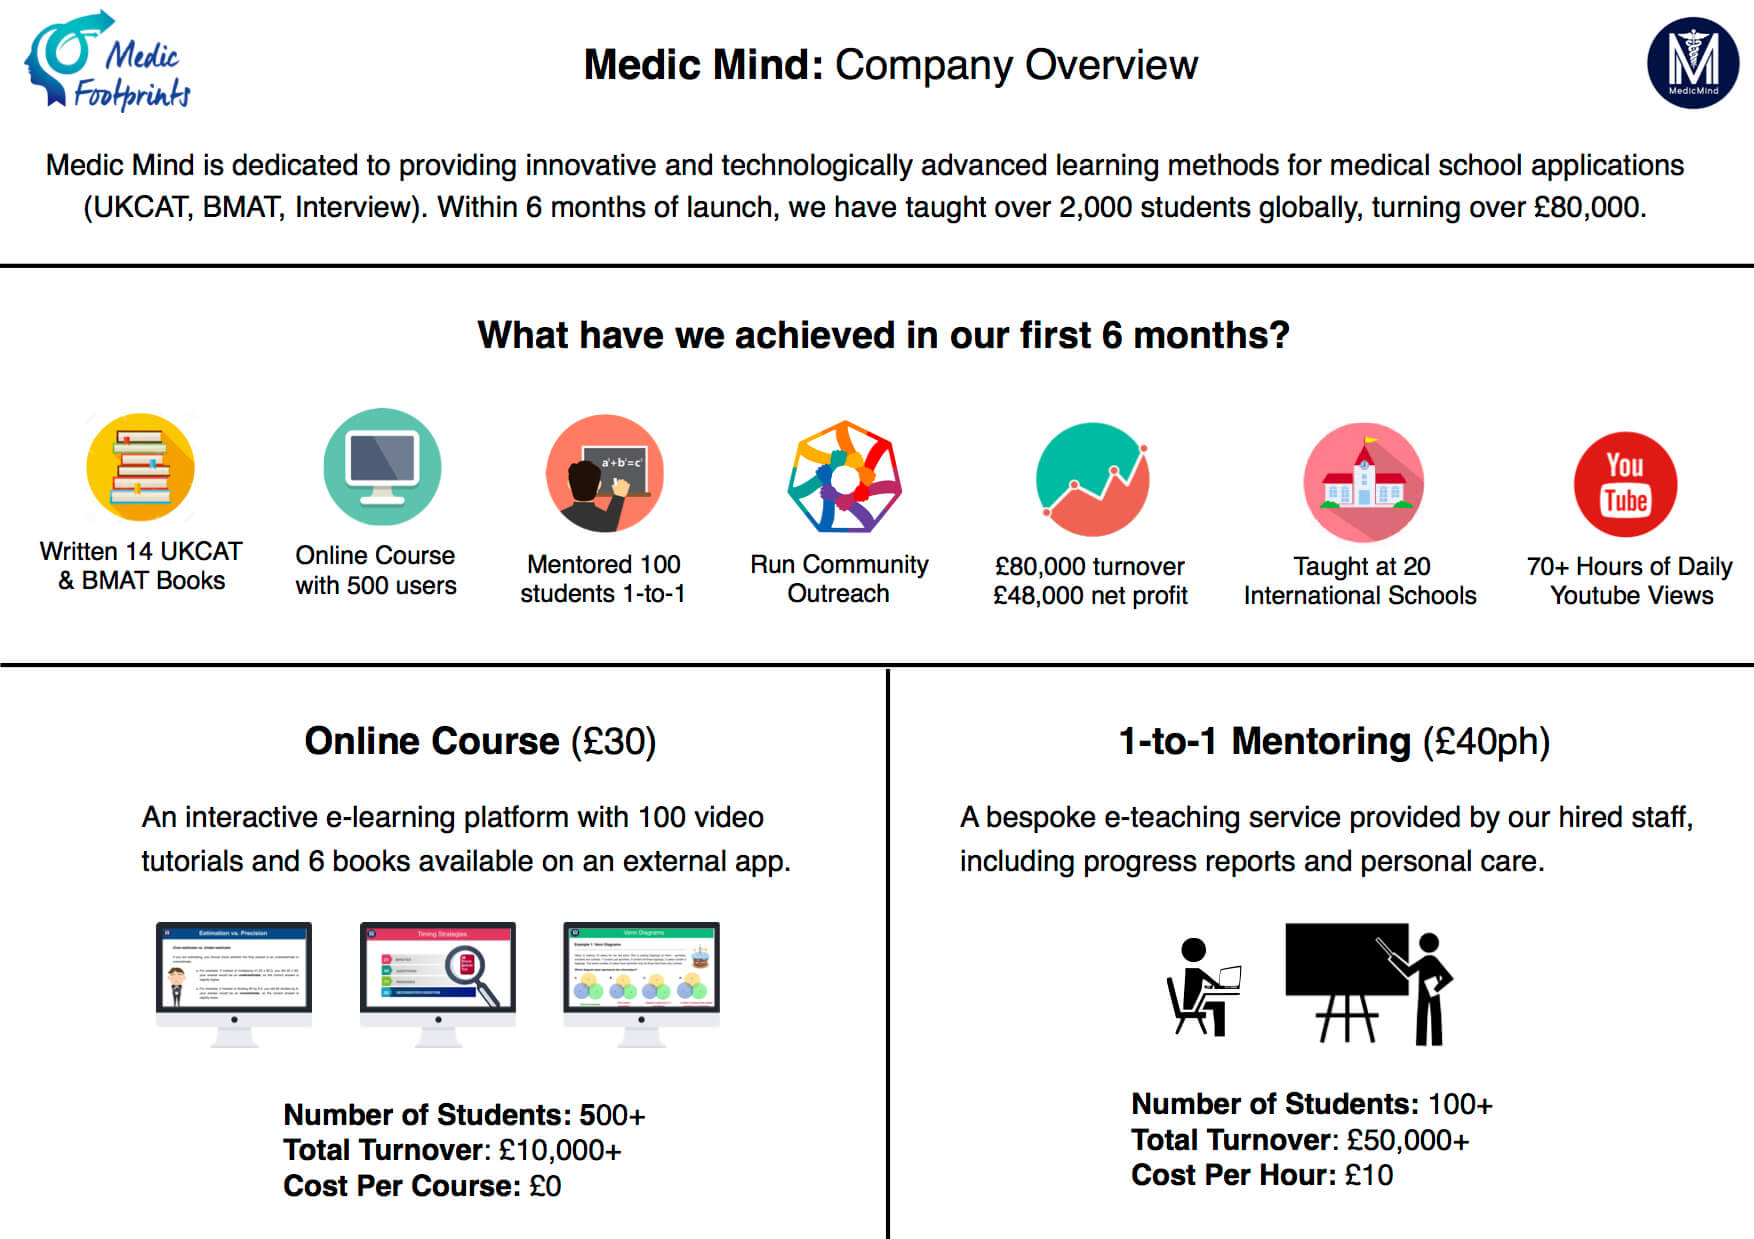 medic-mind-overview